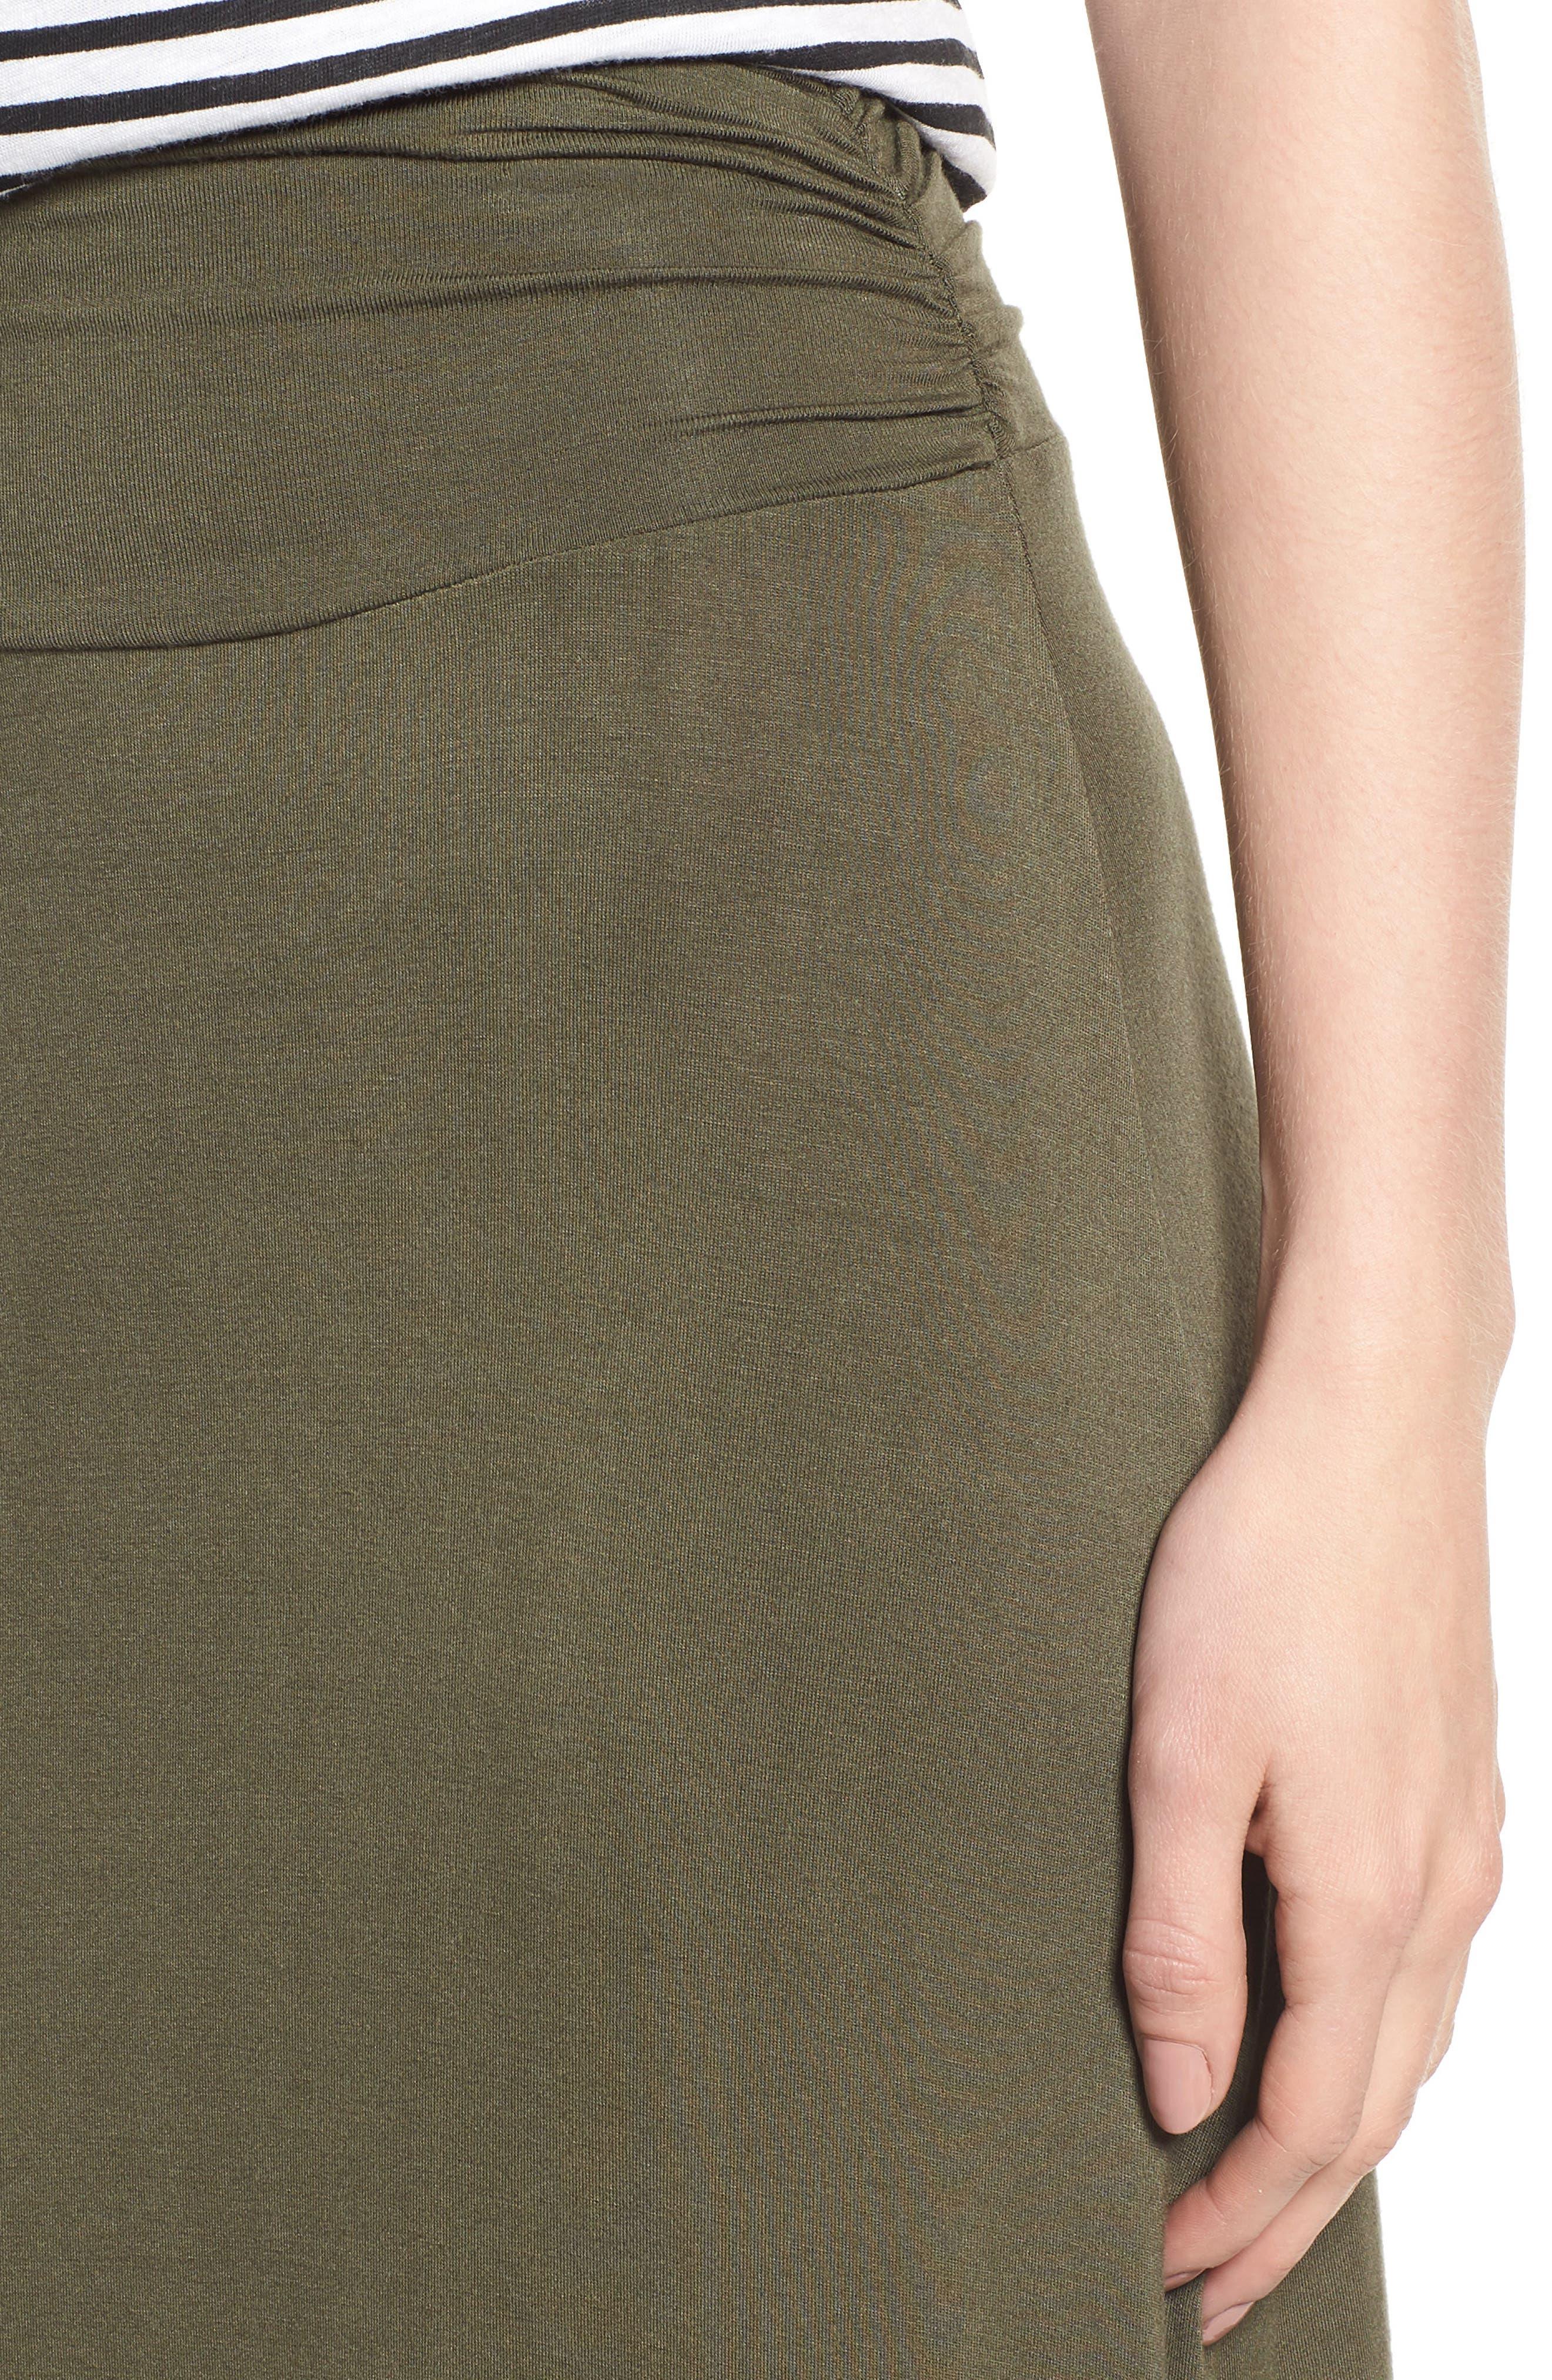 Ruched Waist Side Slit Maxi Skirt,                             Alternate thumbnail 4, color,                             302